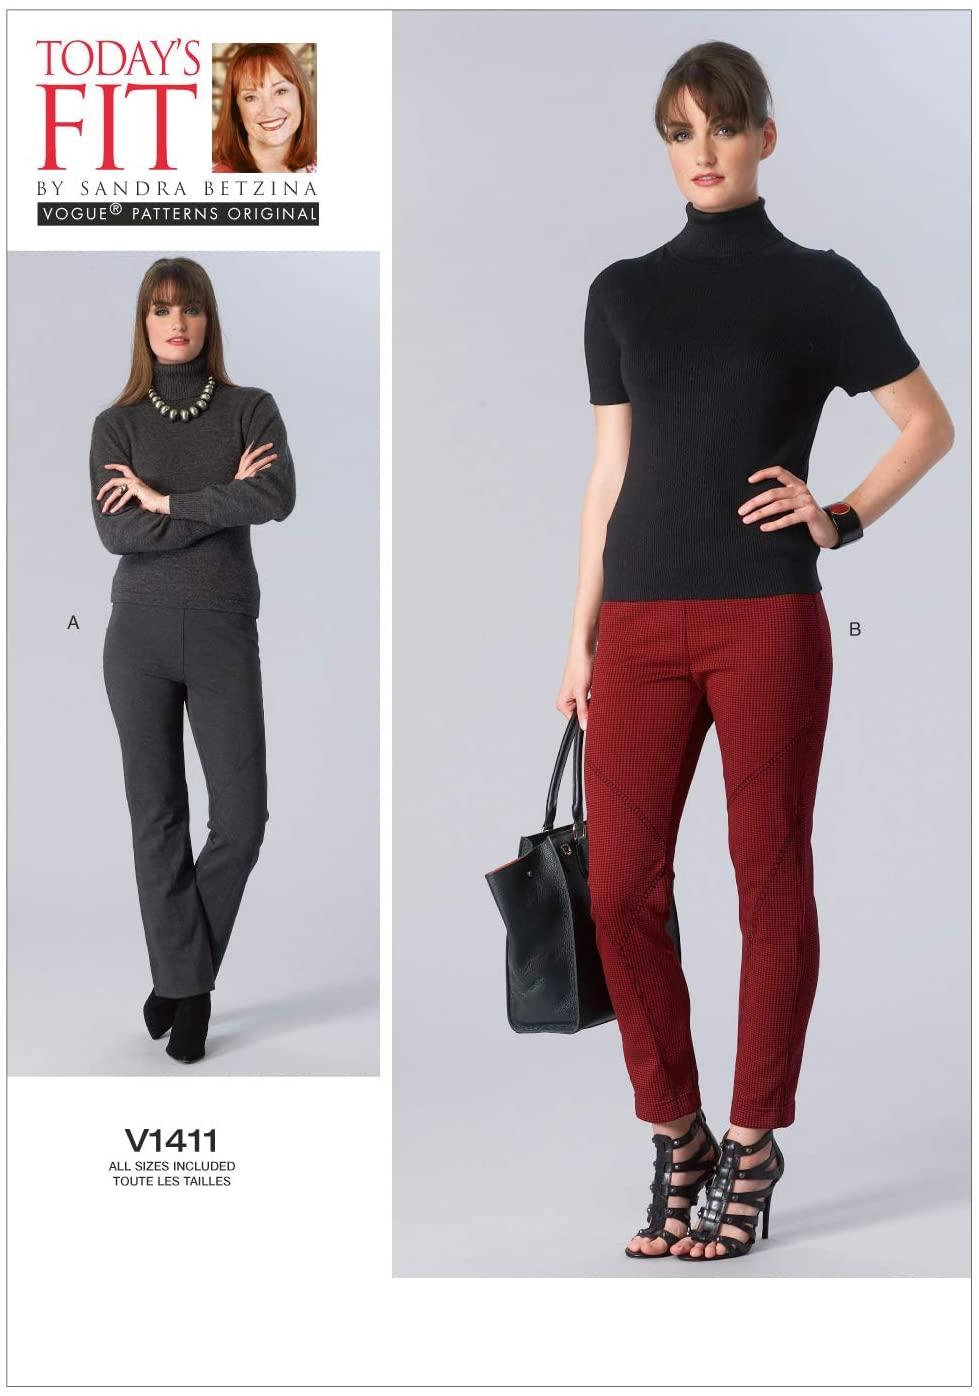 VOGUE PATTERNS V1411 Misses' Pants Sewing Template